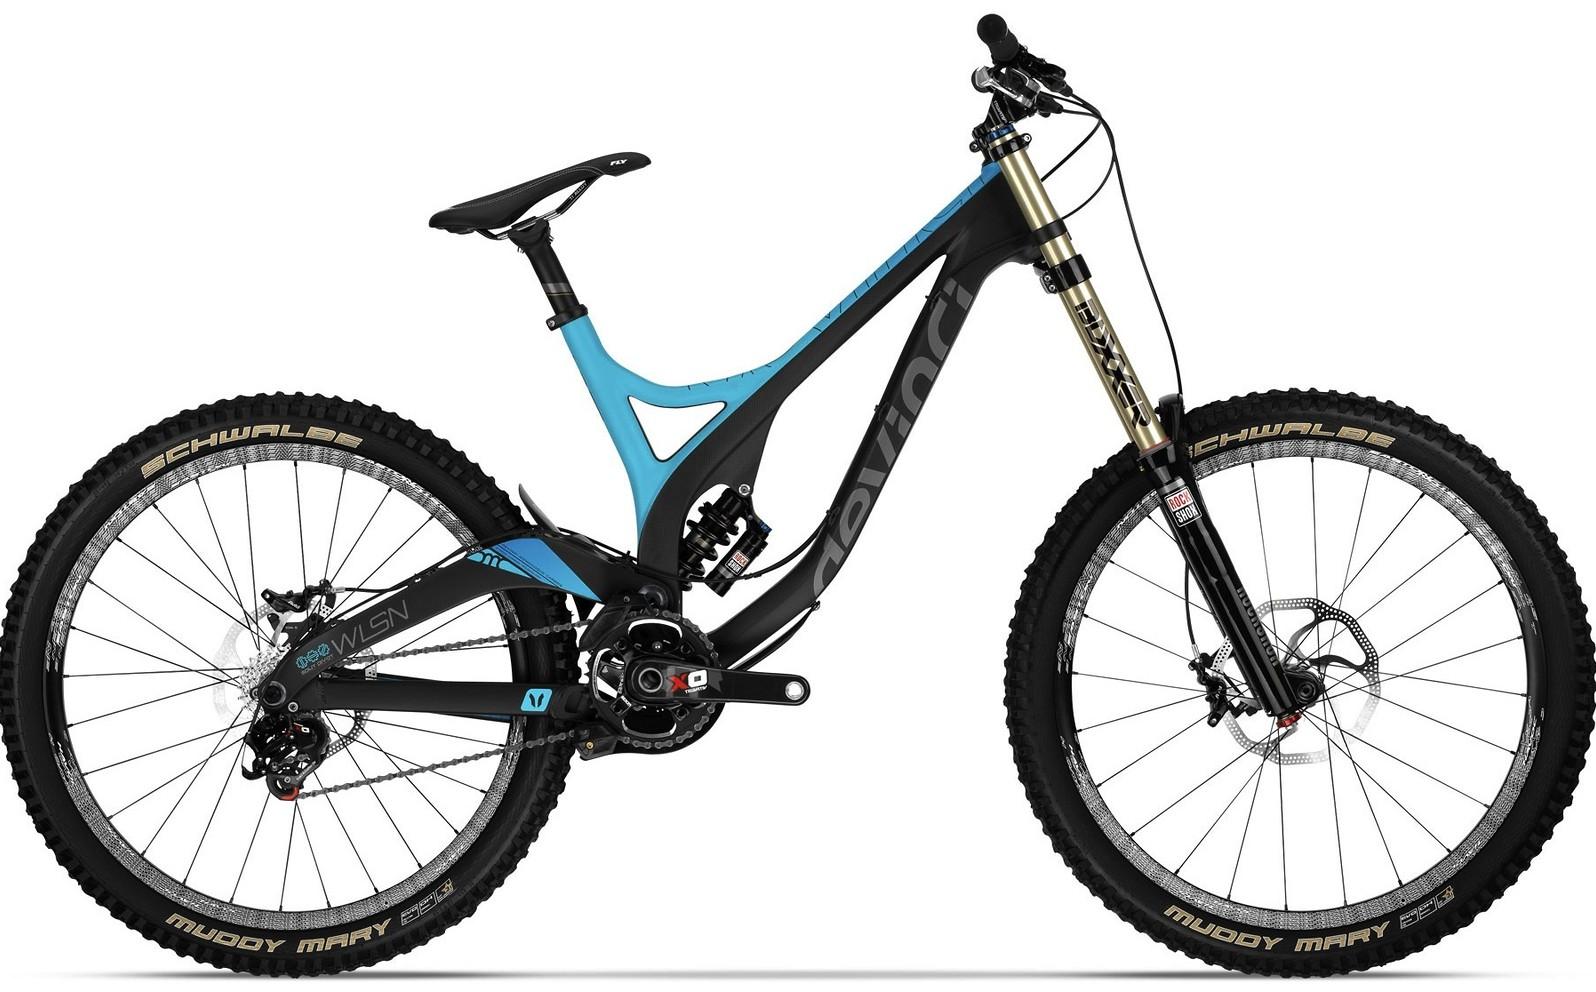 Bike - 2014 Devinci Wilson Carbon SL